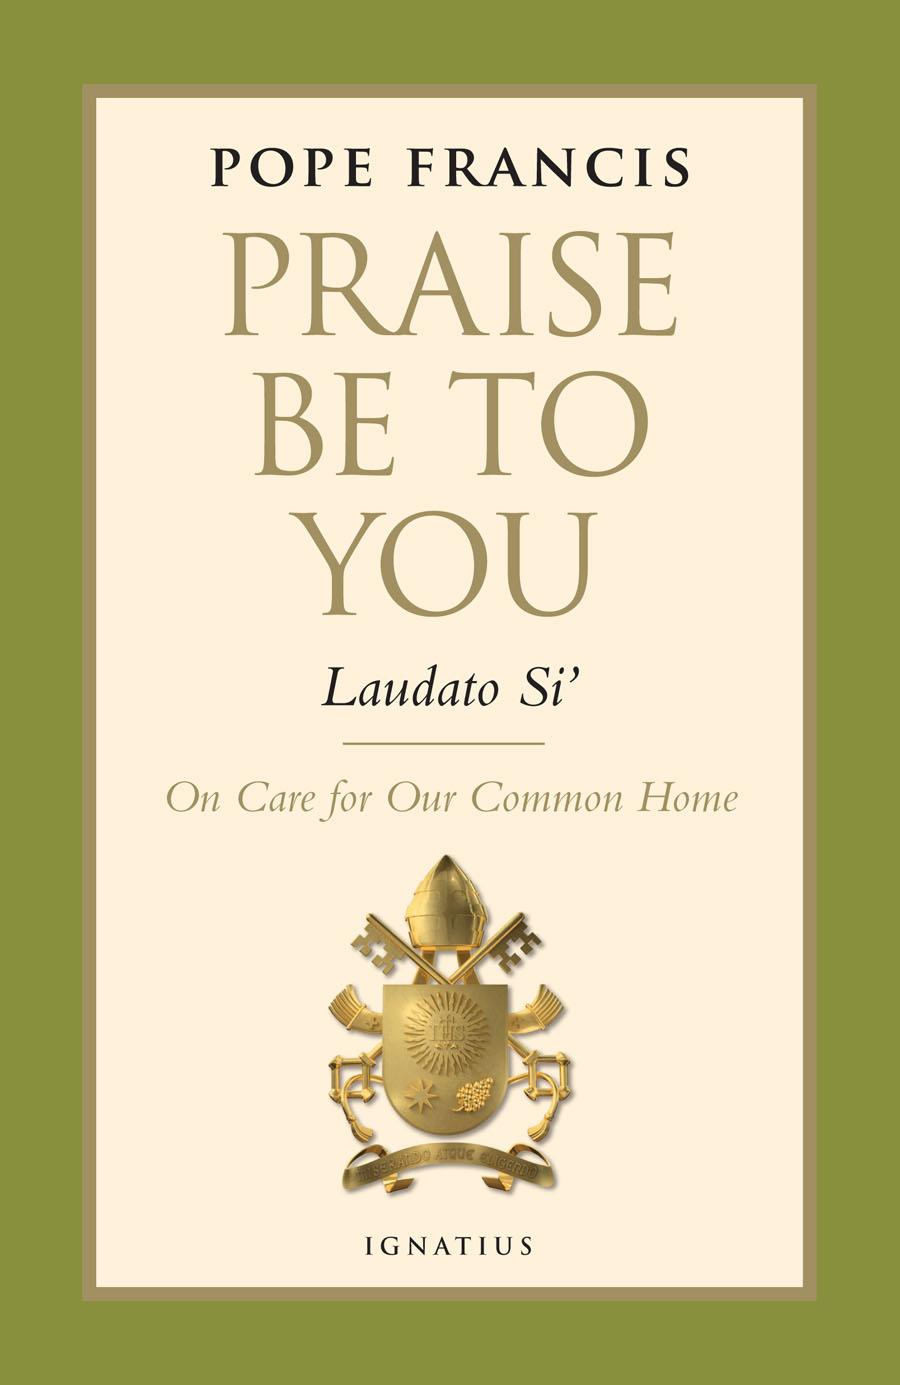 Laudato Si.book cover.jpg